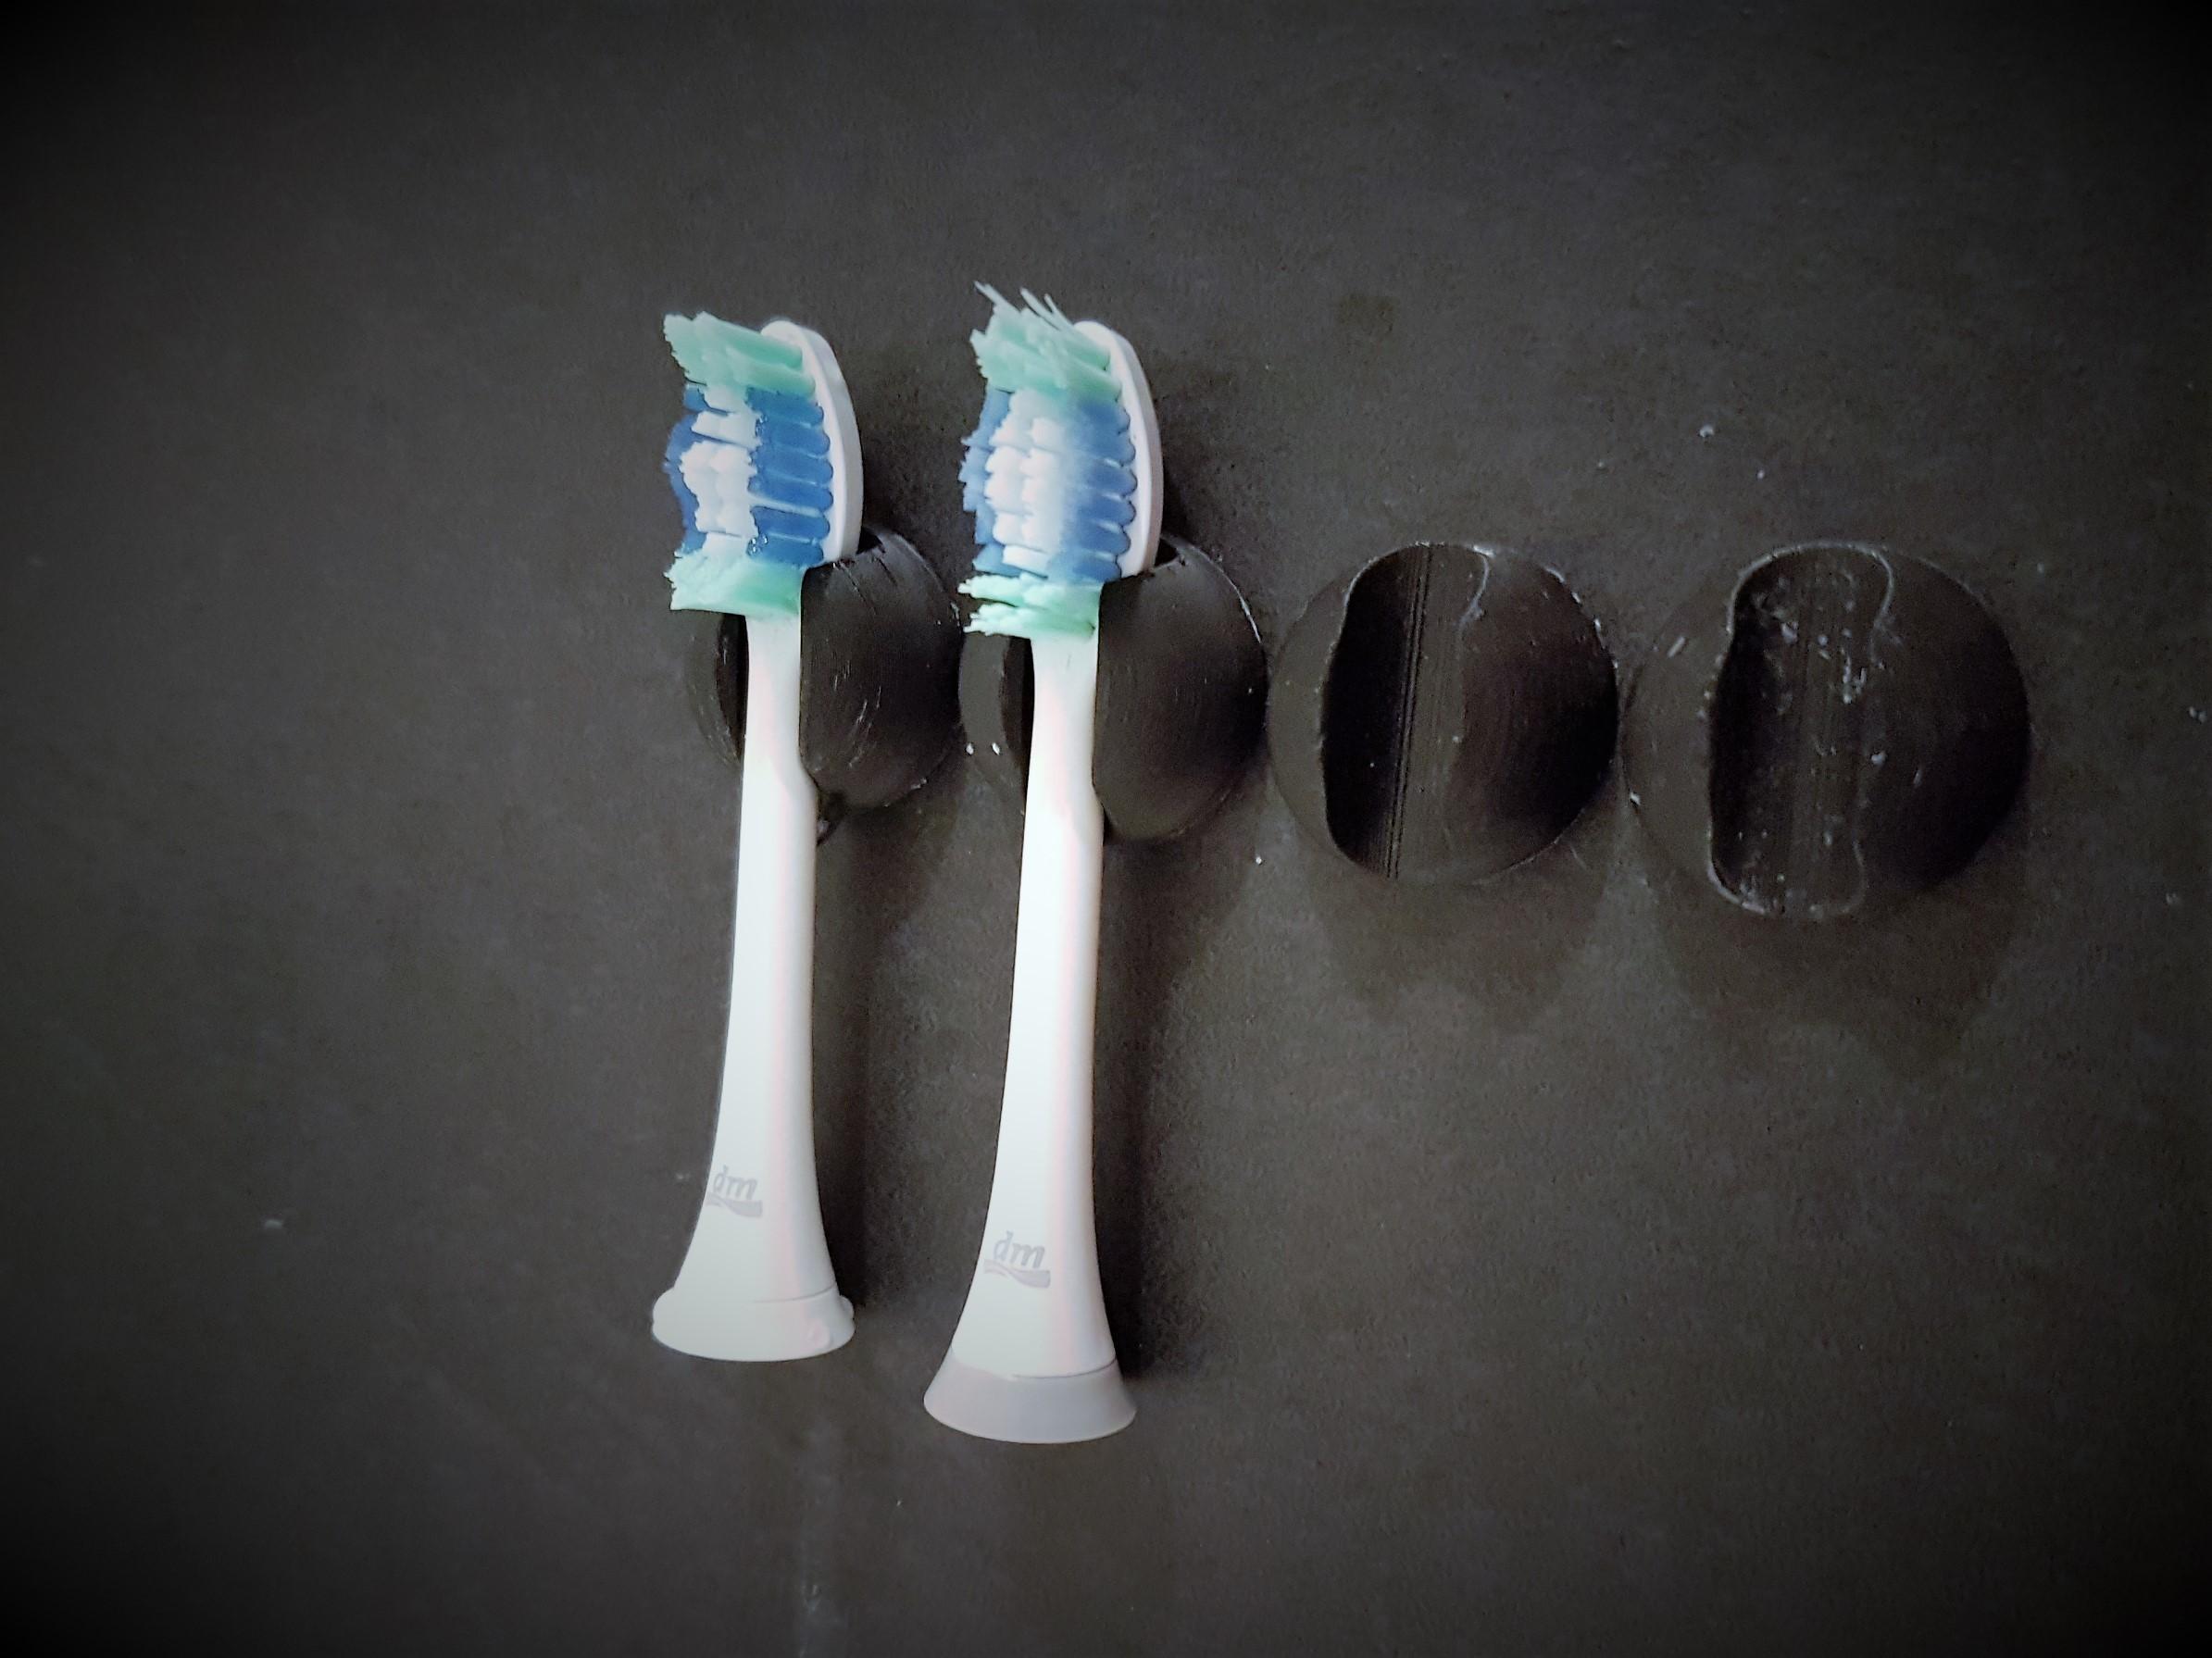 jtronics_sonicare_brush_mount.jpg Download free STL file Sonicare toothbrush head mount holder  • Design to 3D print, jtronics